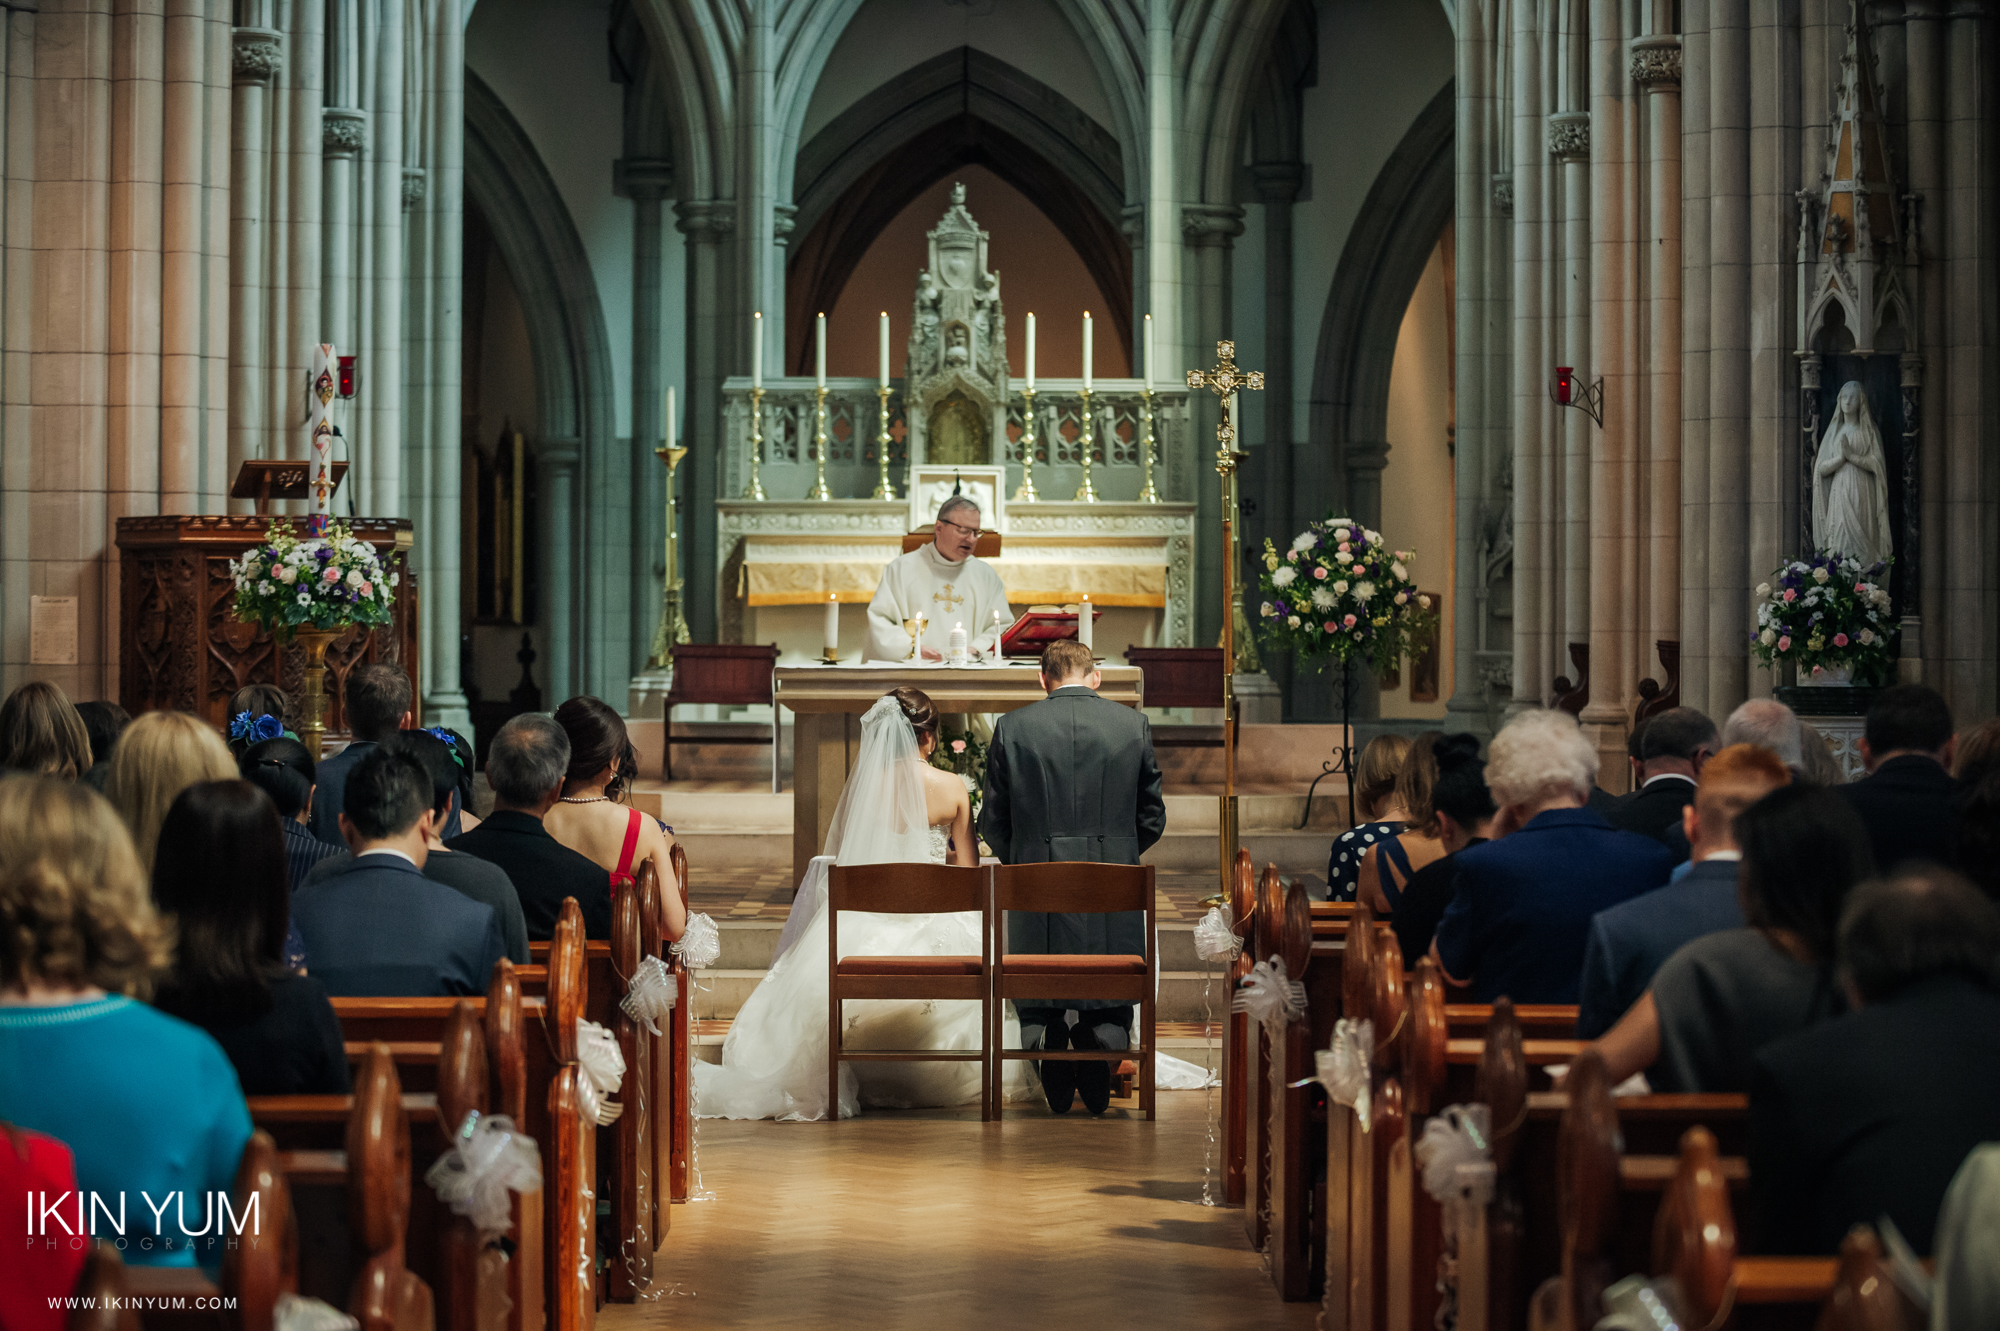 Teresa & Johnathan Weddong Day - The Ceremony-0138.jpg